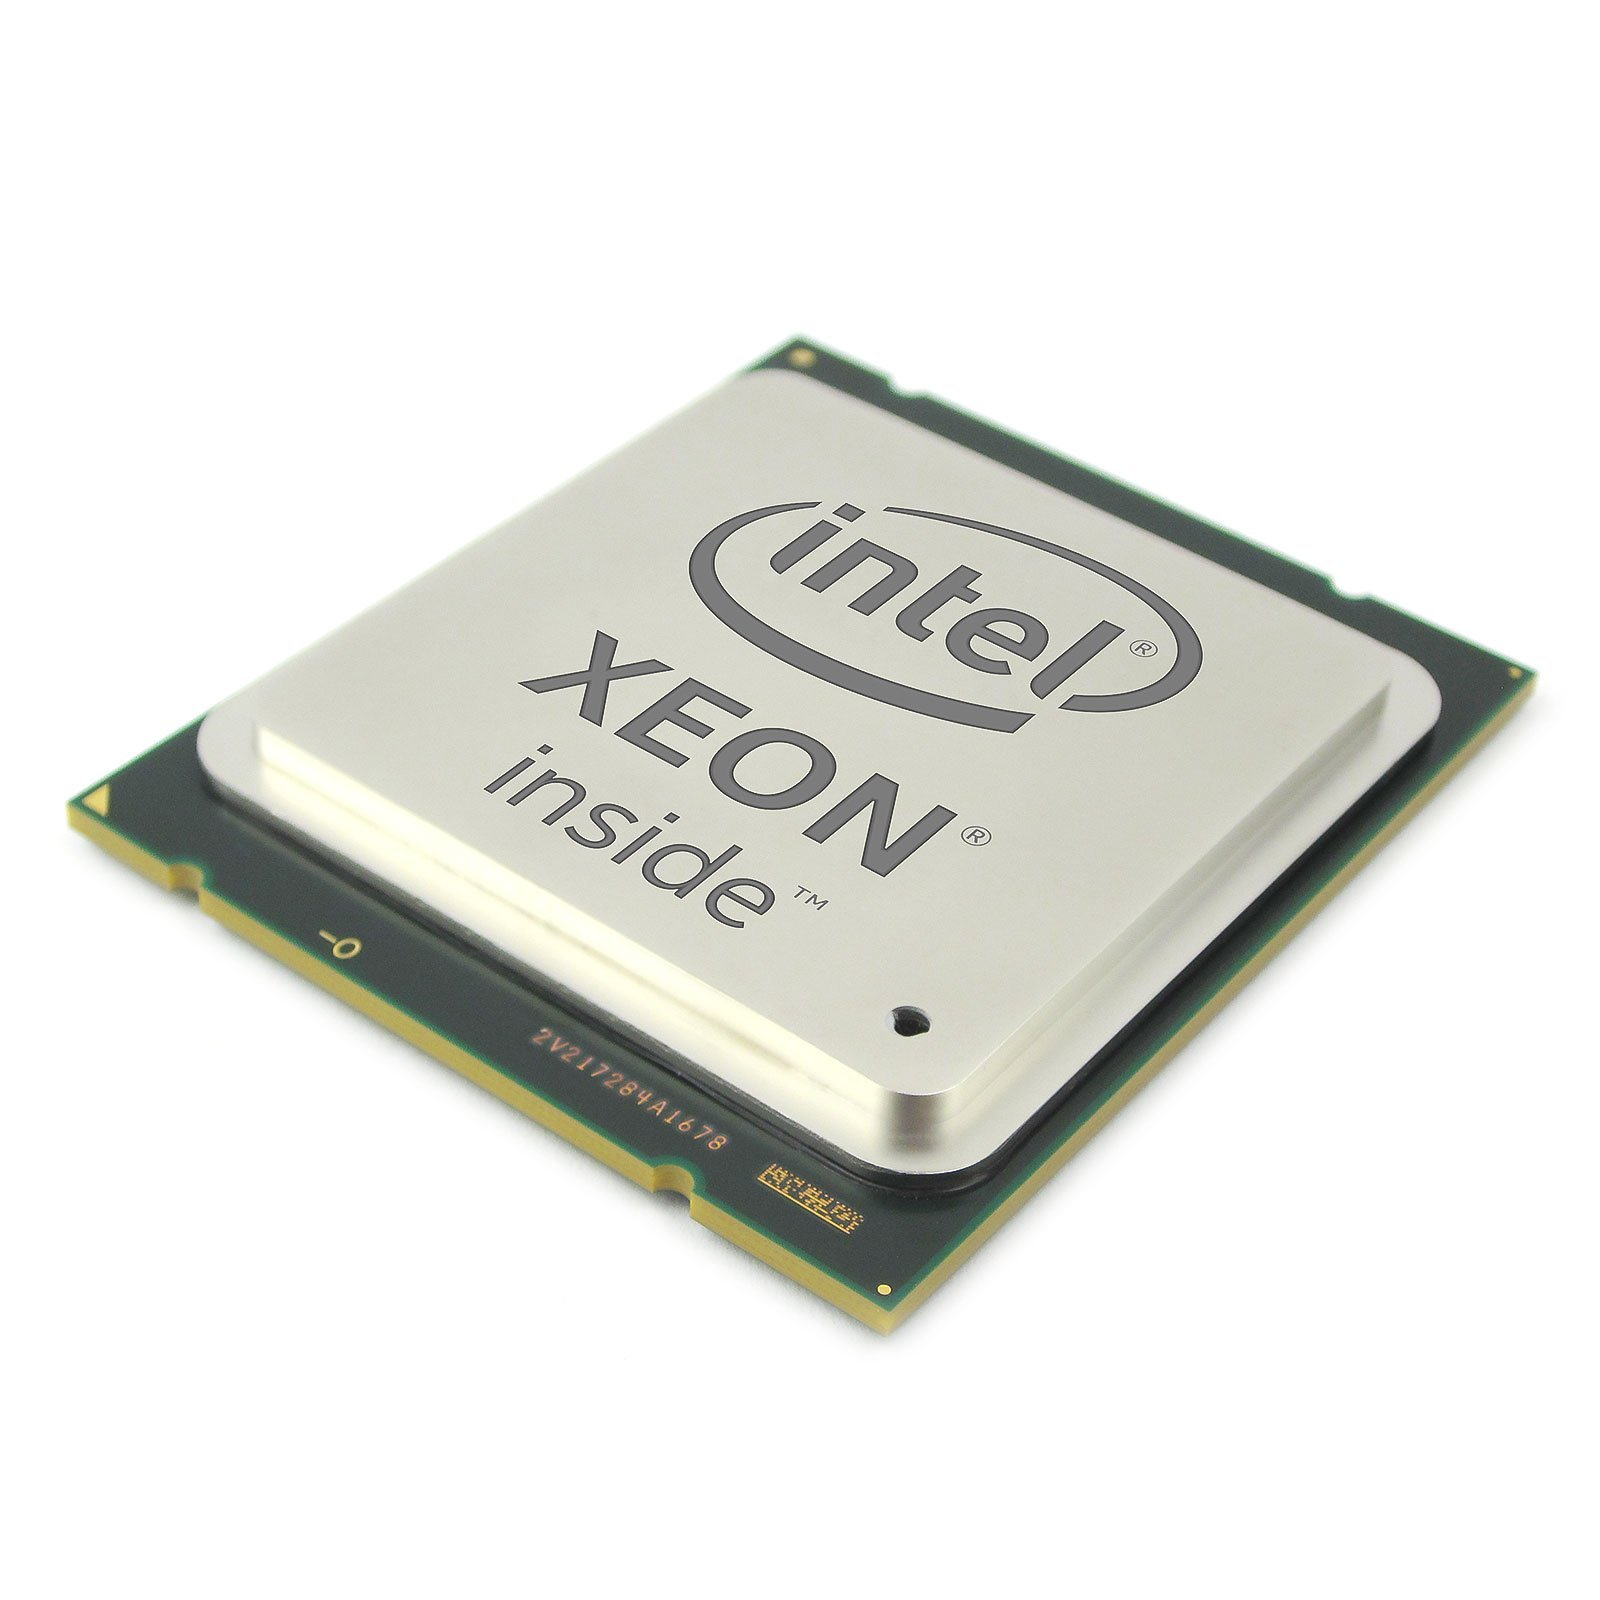 Intel Xeon 3040 Processor (1.86Ghz) (Certified Refurbished) by Intel